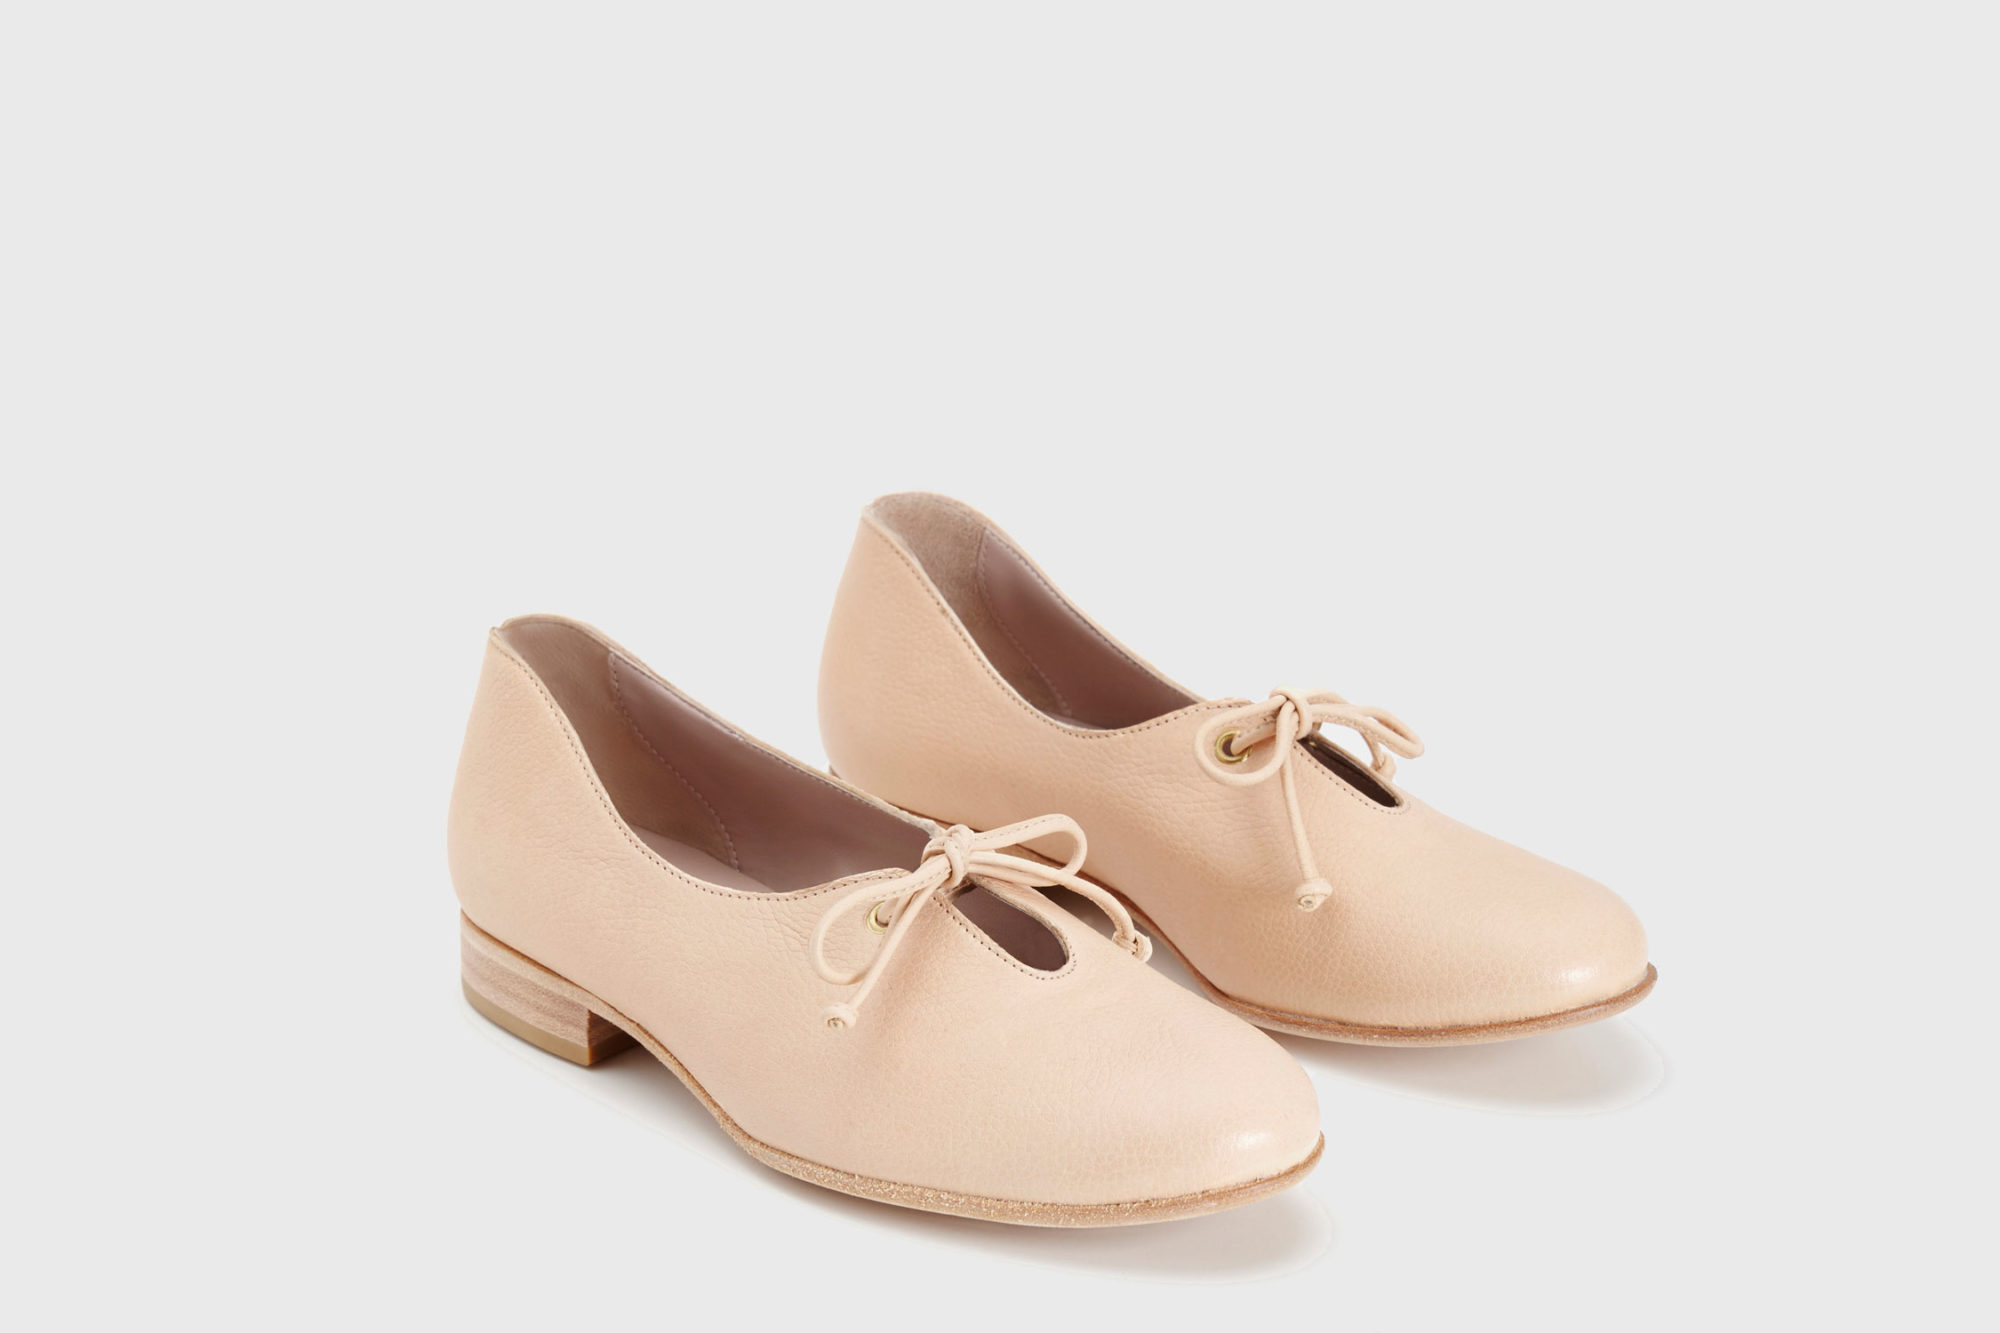 Dorotea zapato de cordones Carrie nude ss17 par